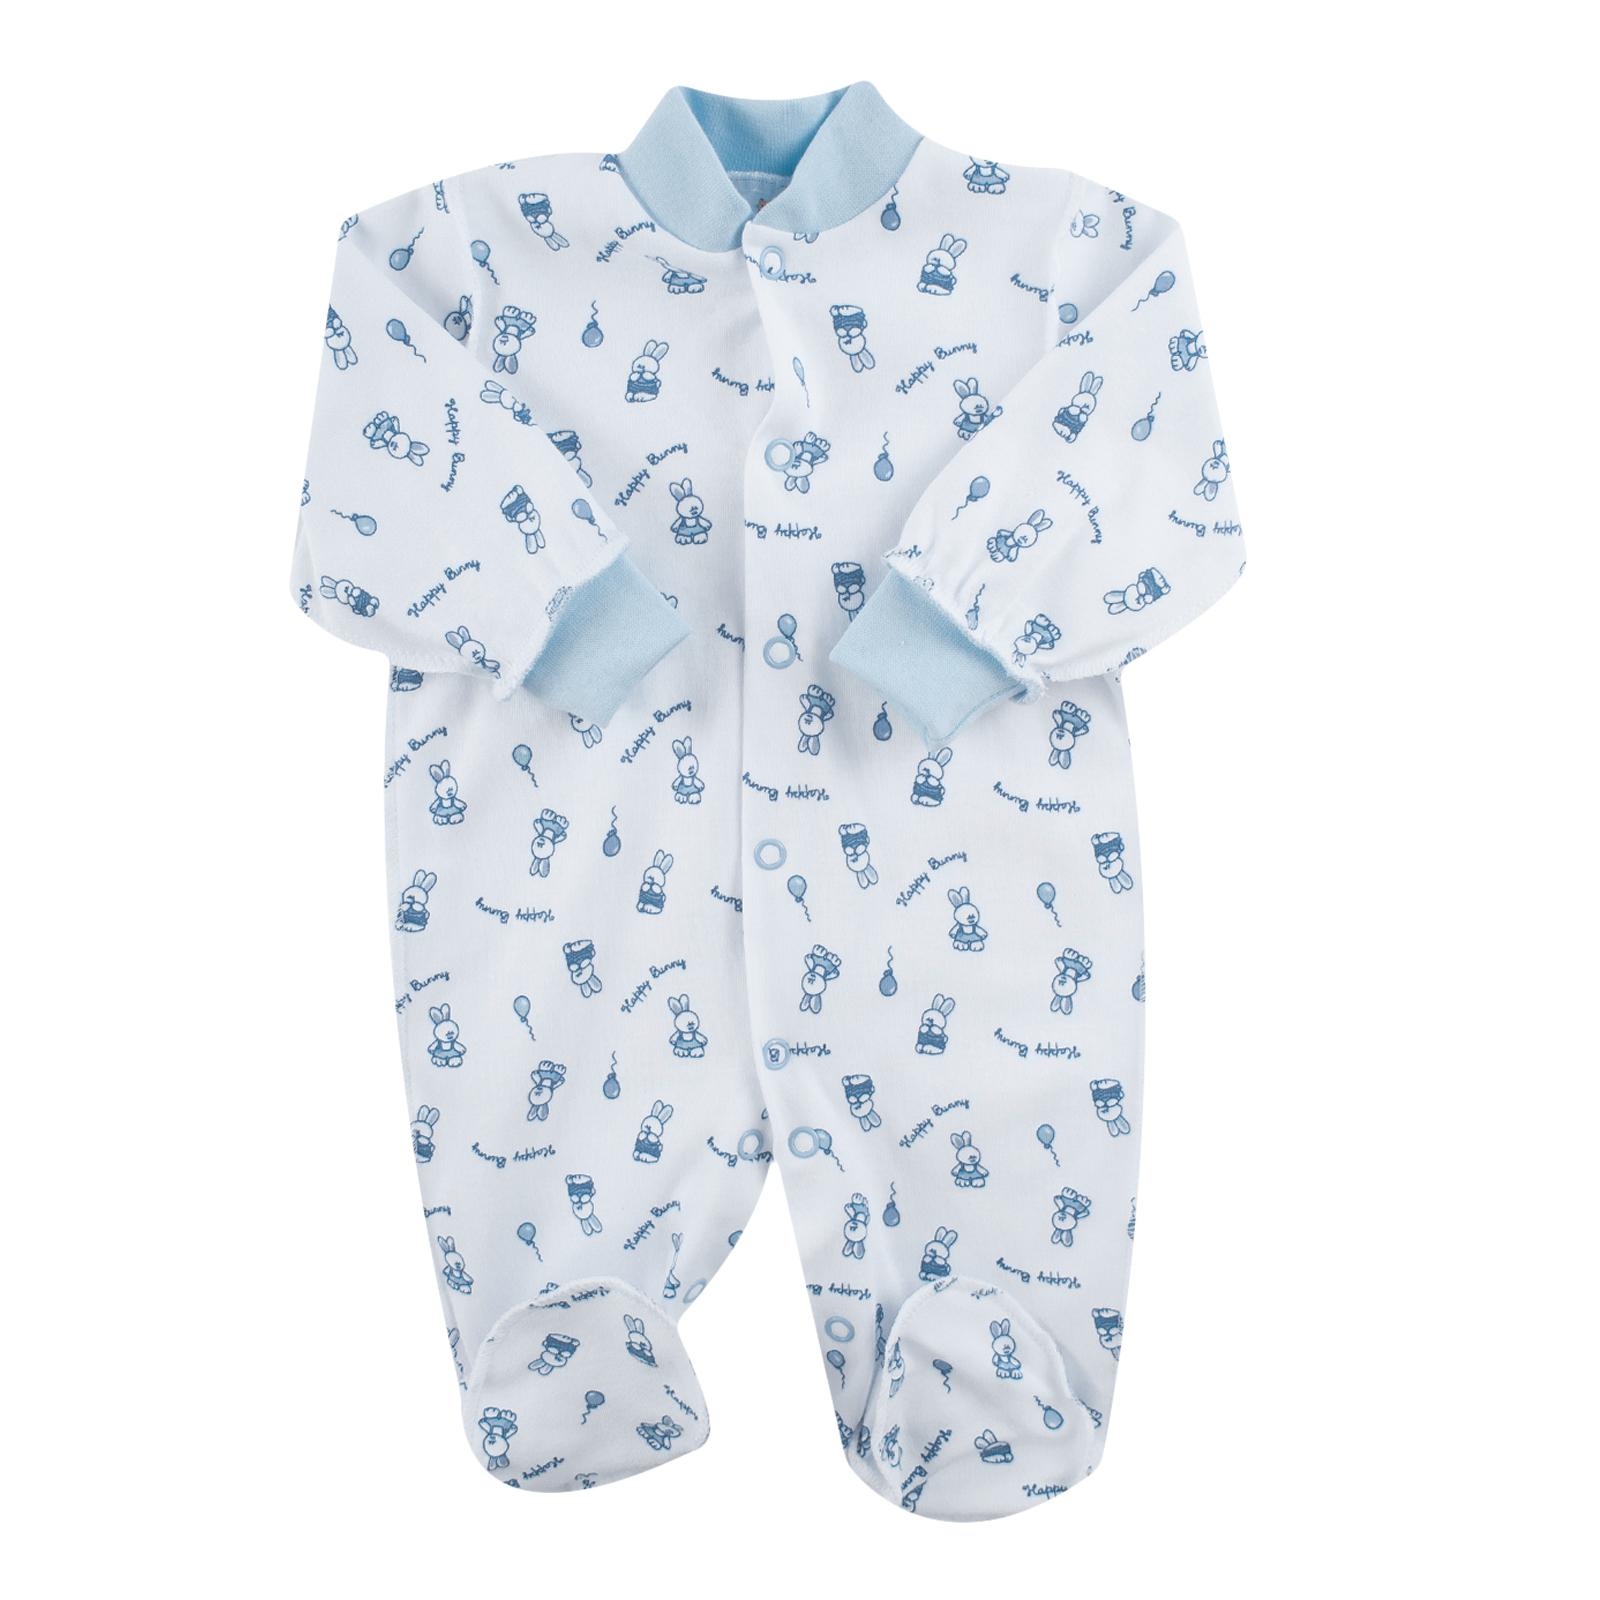 Комбинезон КОТМАРКОТ для мальчика, цвет набивка голубой тон 6-9 мес (размер 74)<br>